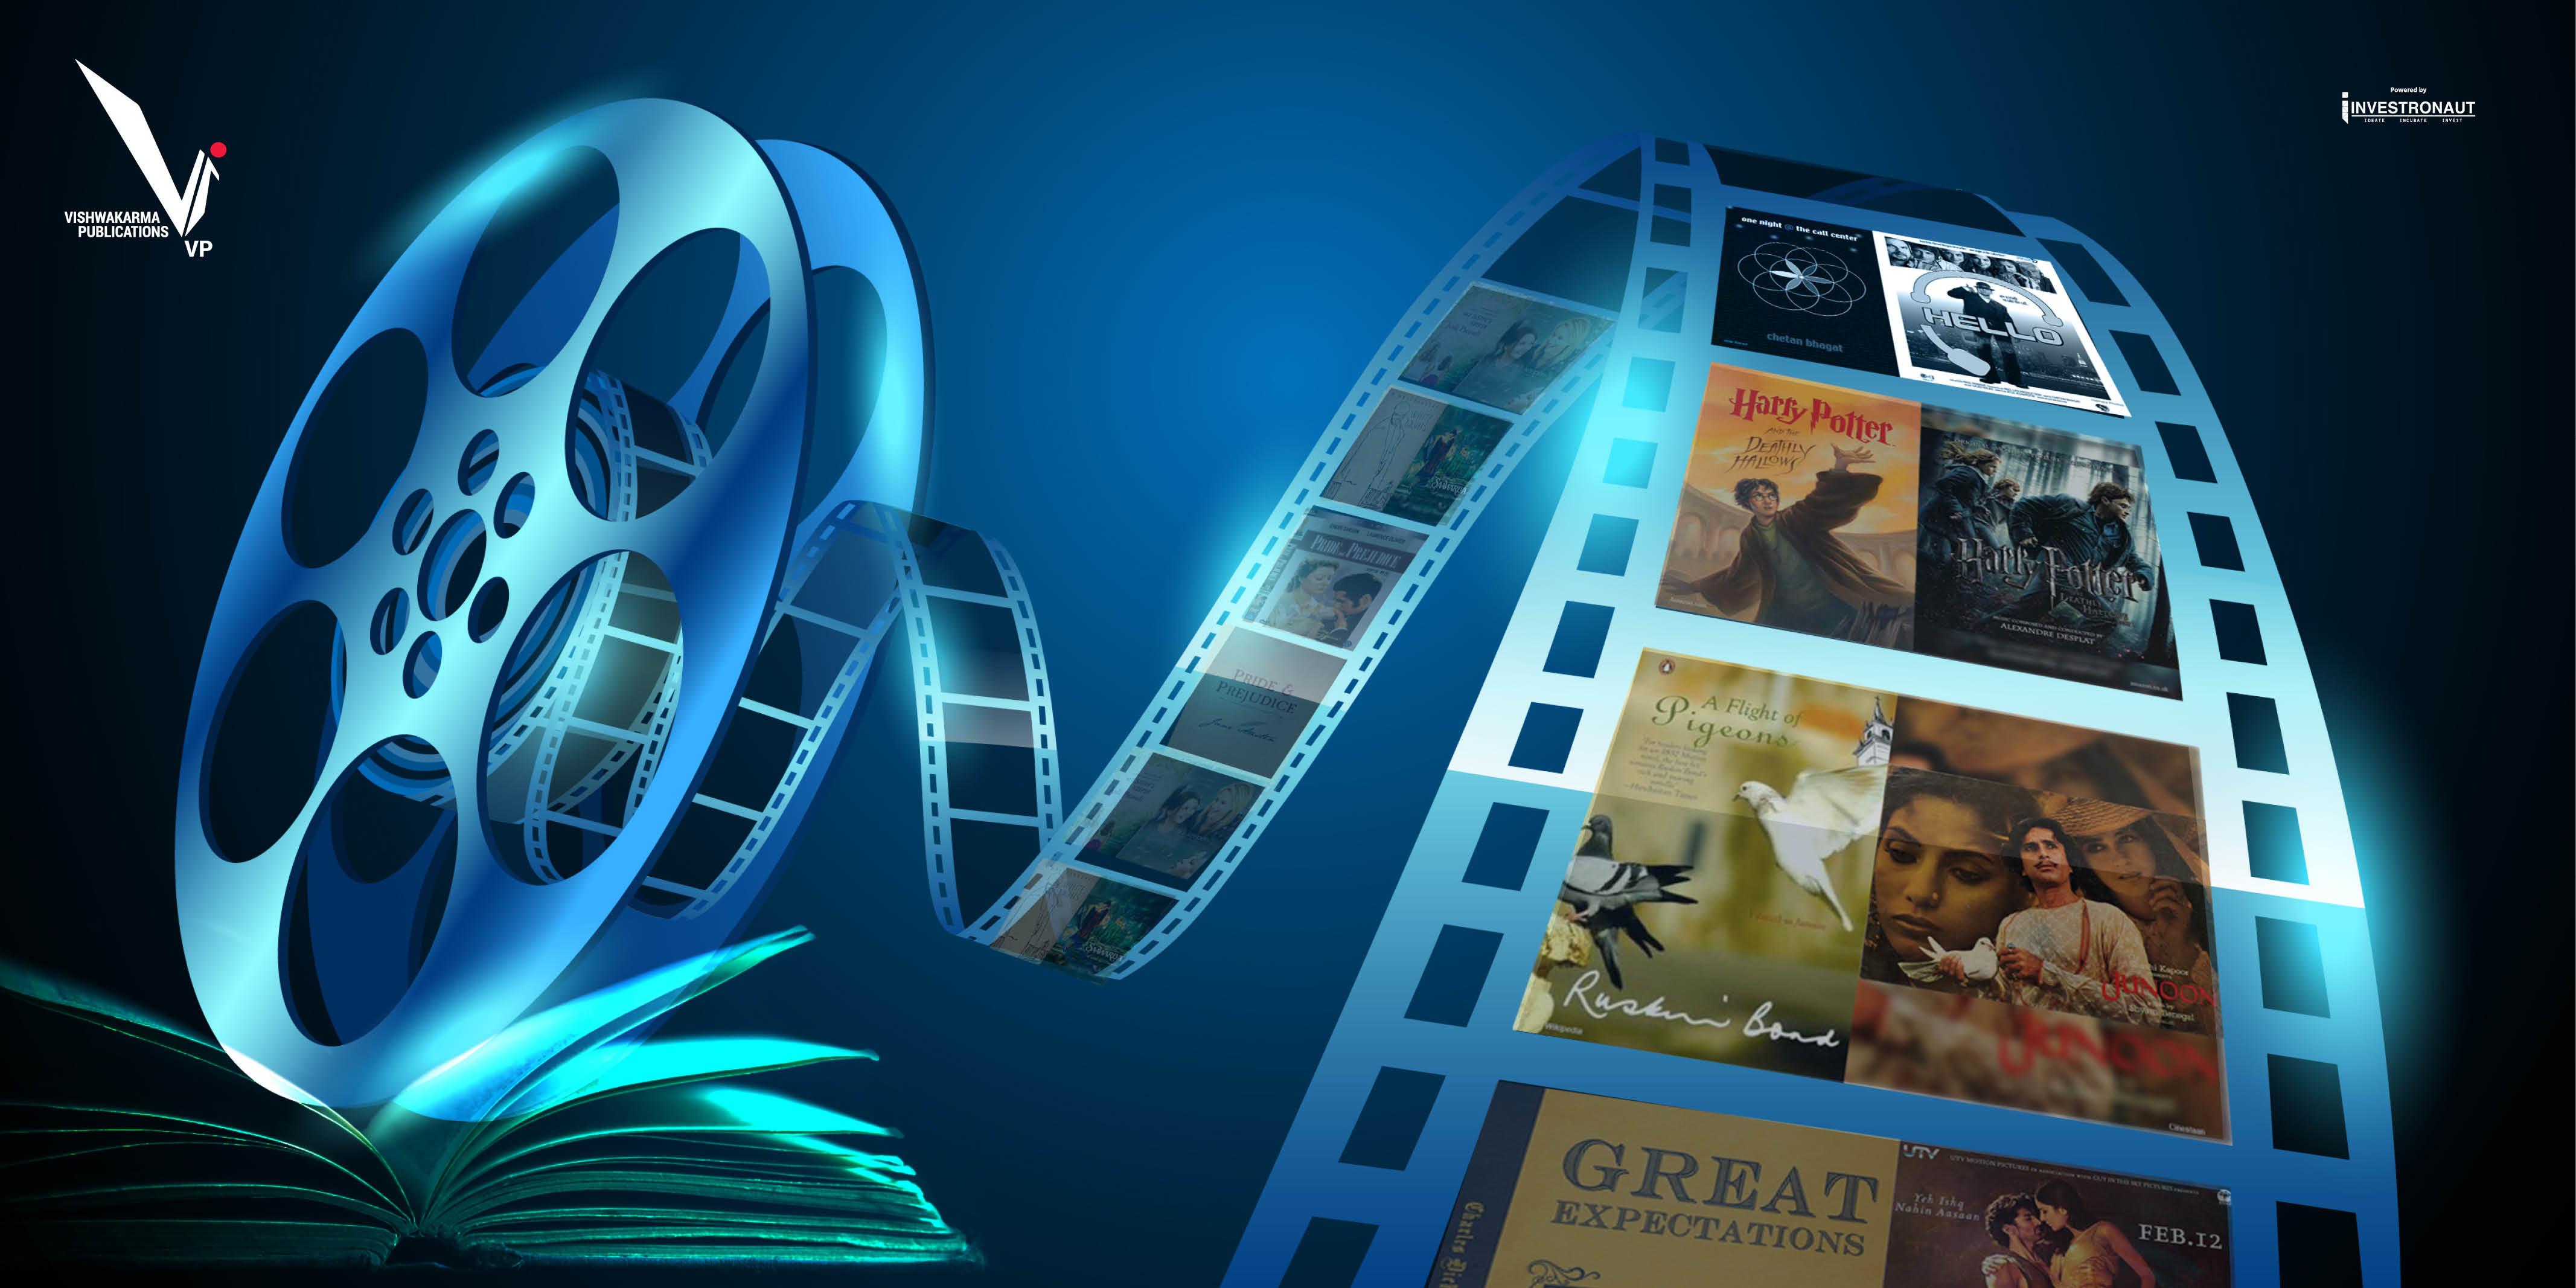 8 Worst Movies Based on Books